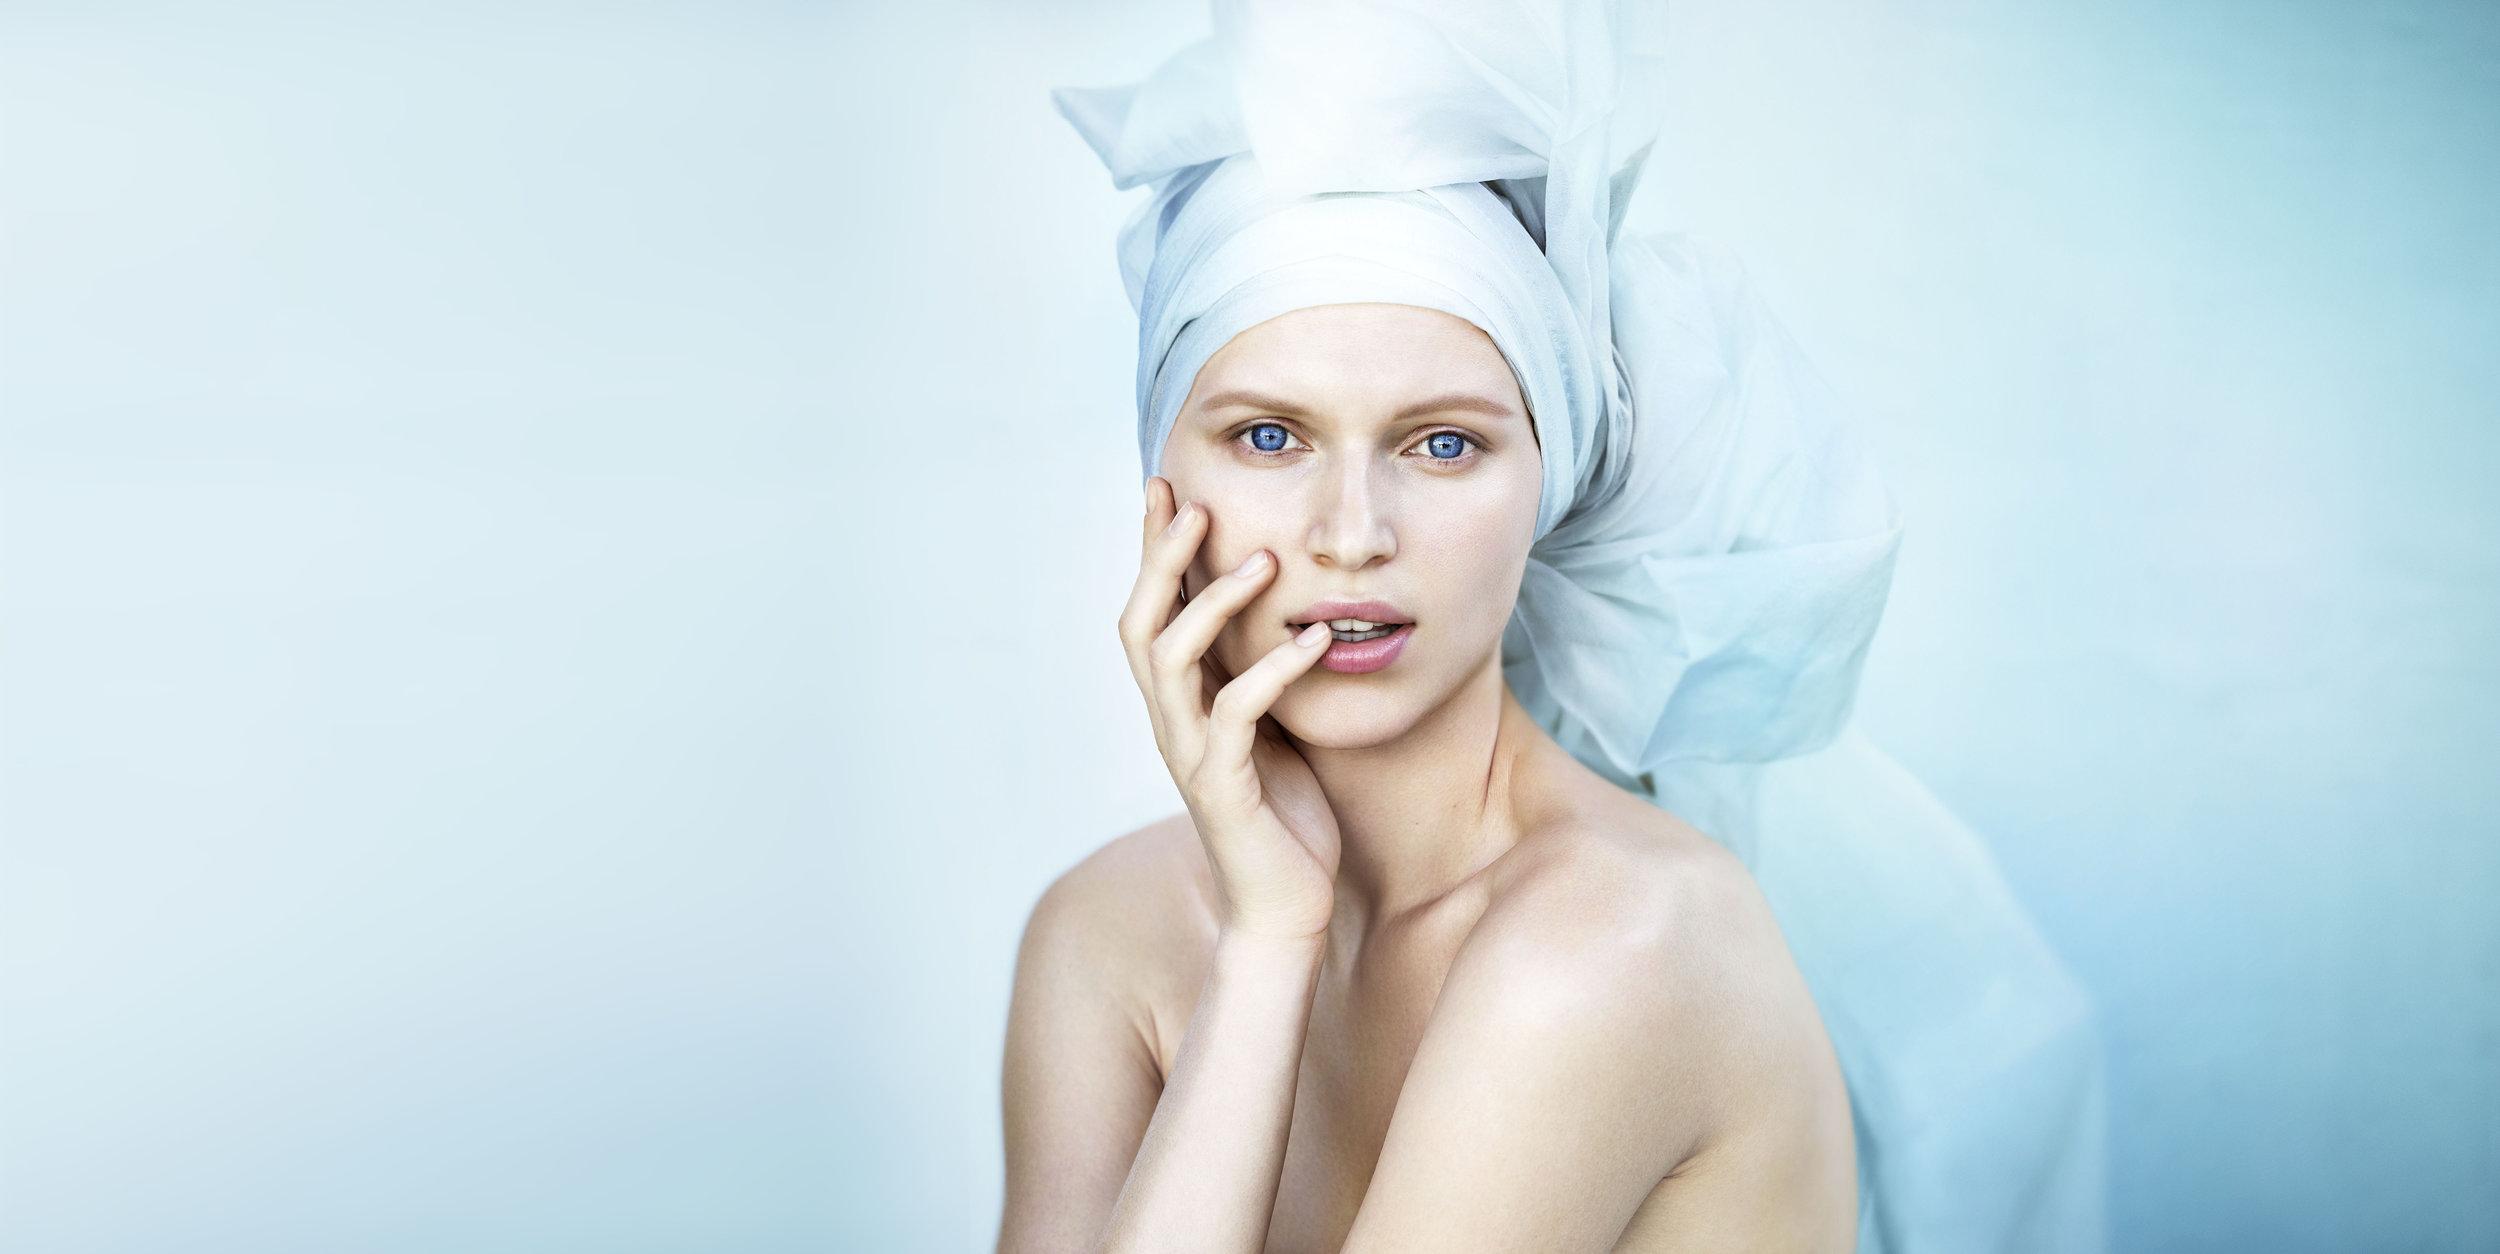 Tulasara_Beauty_Image_horizontal-Longer.jpg